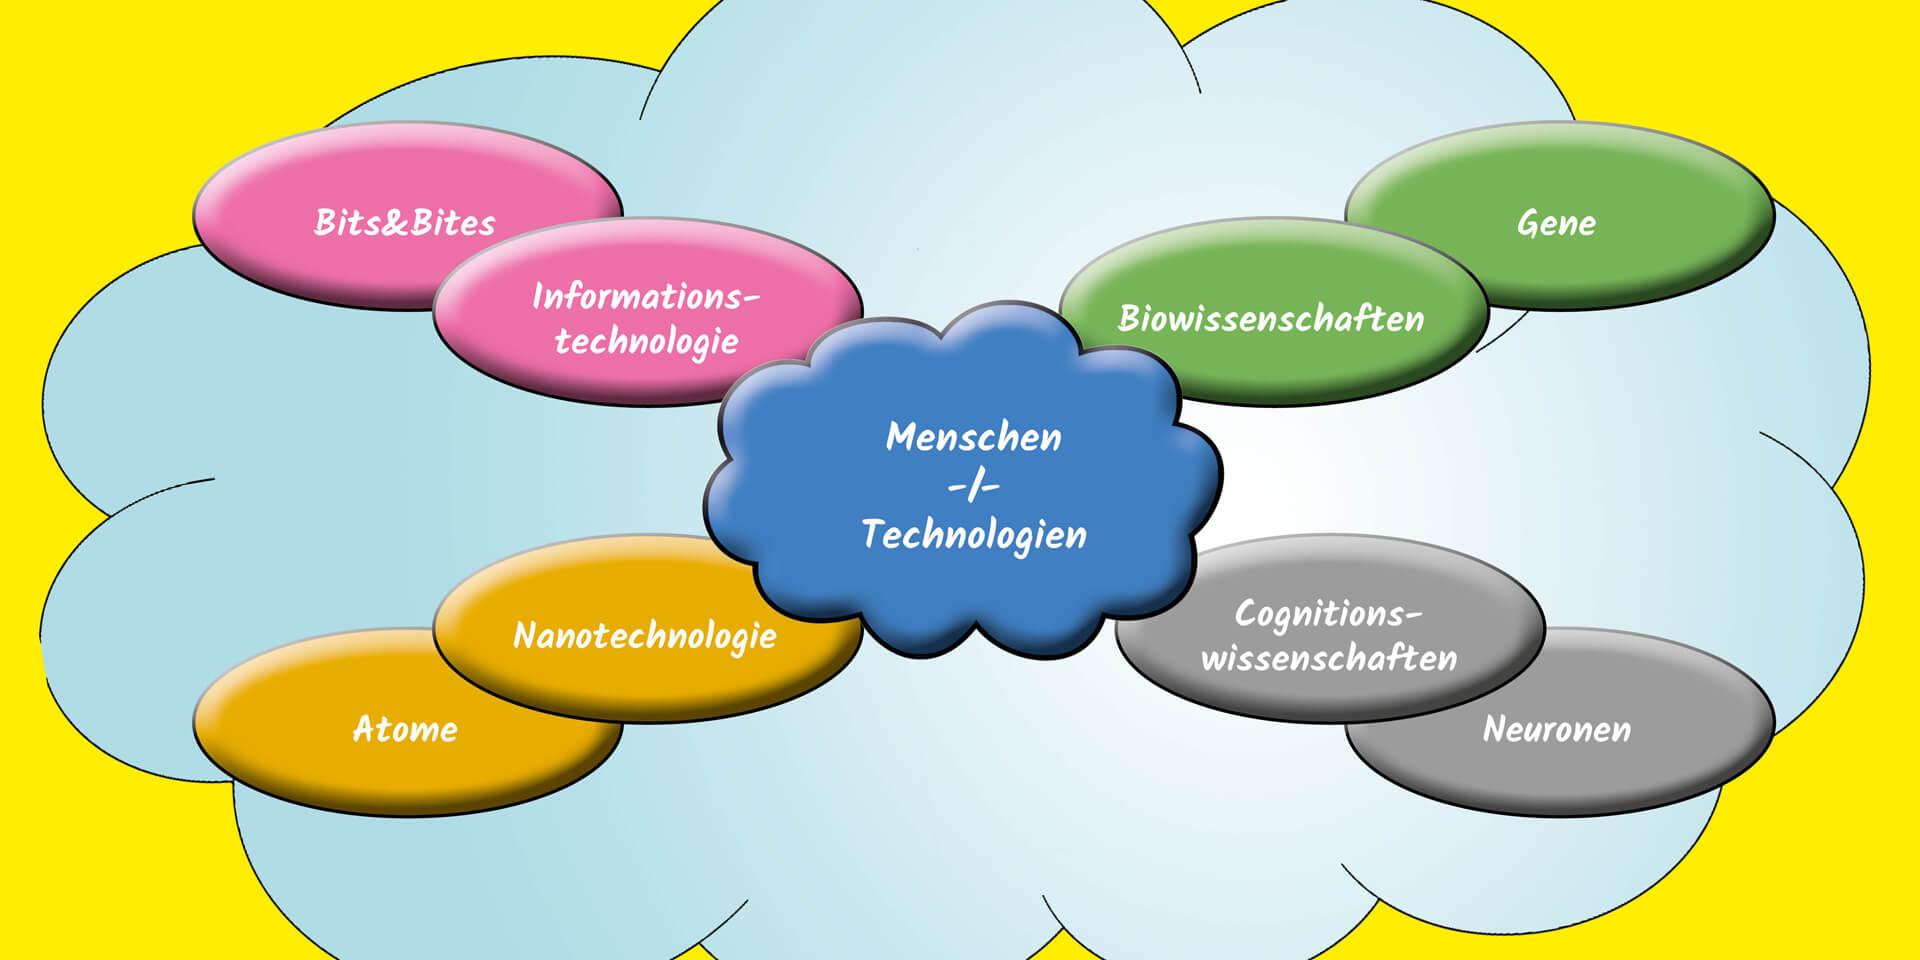 Ethik, Technologie, Naturwissenschaft – ein multidisziplinäres Feld